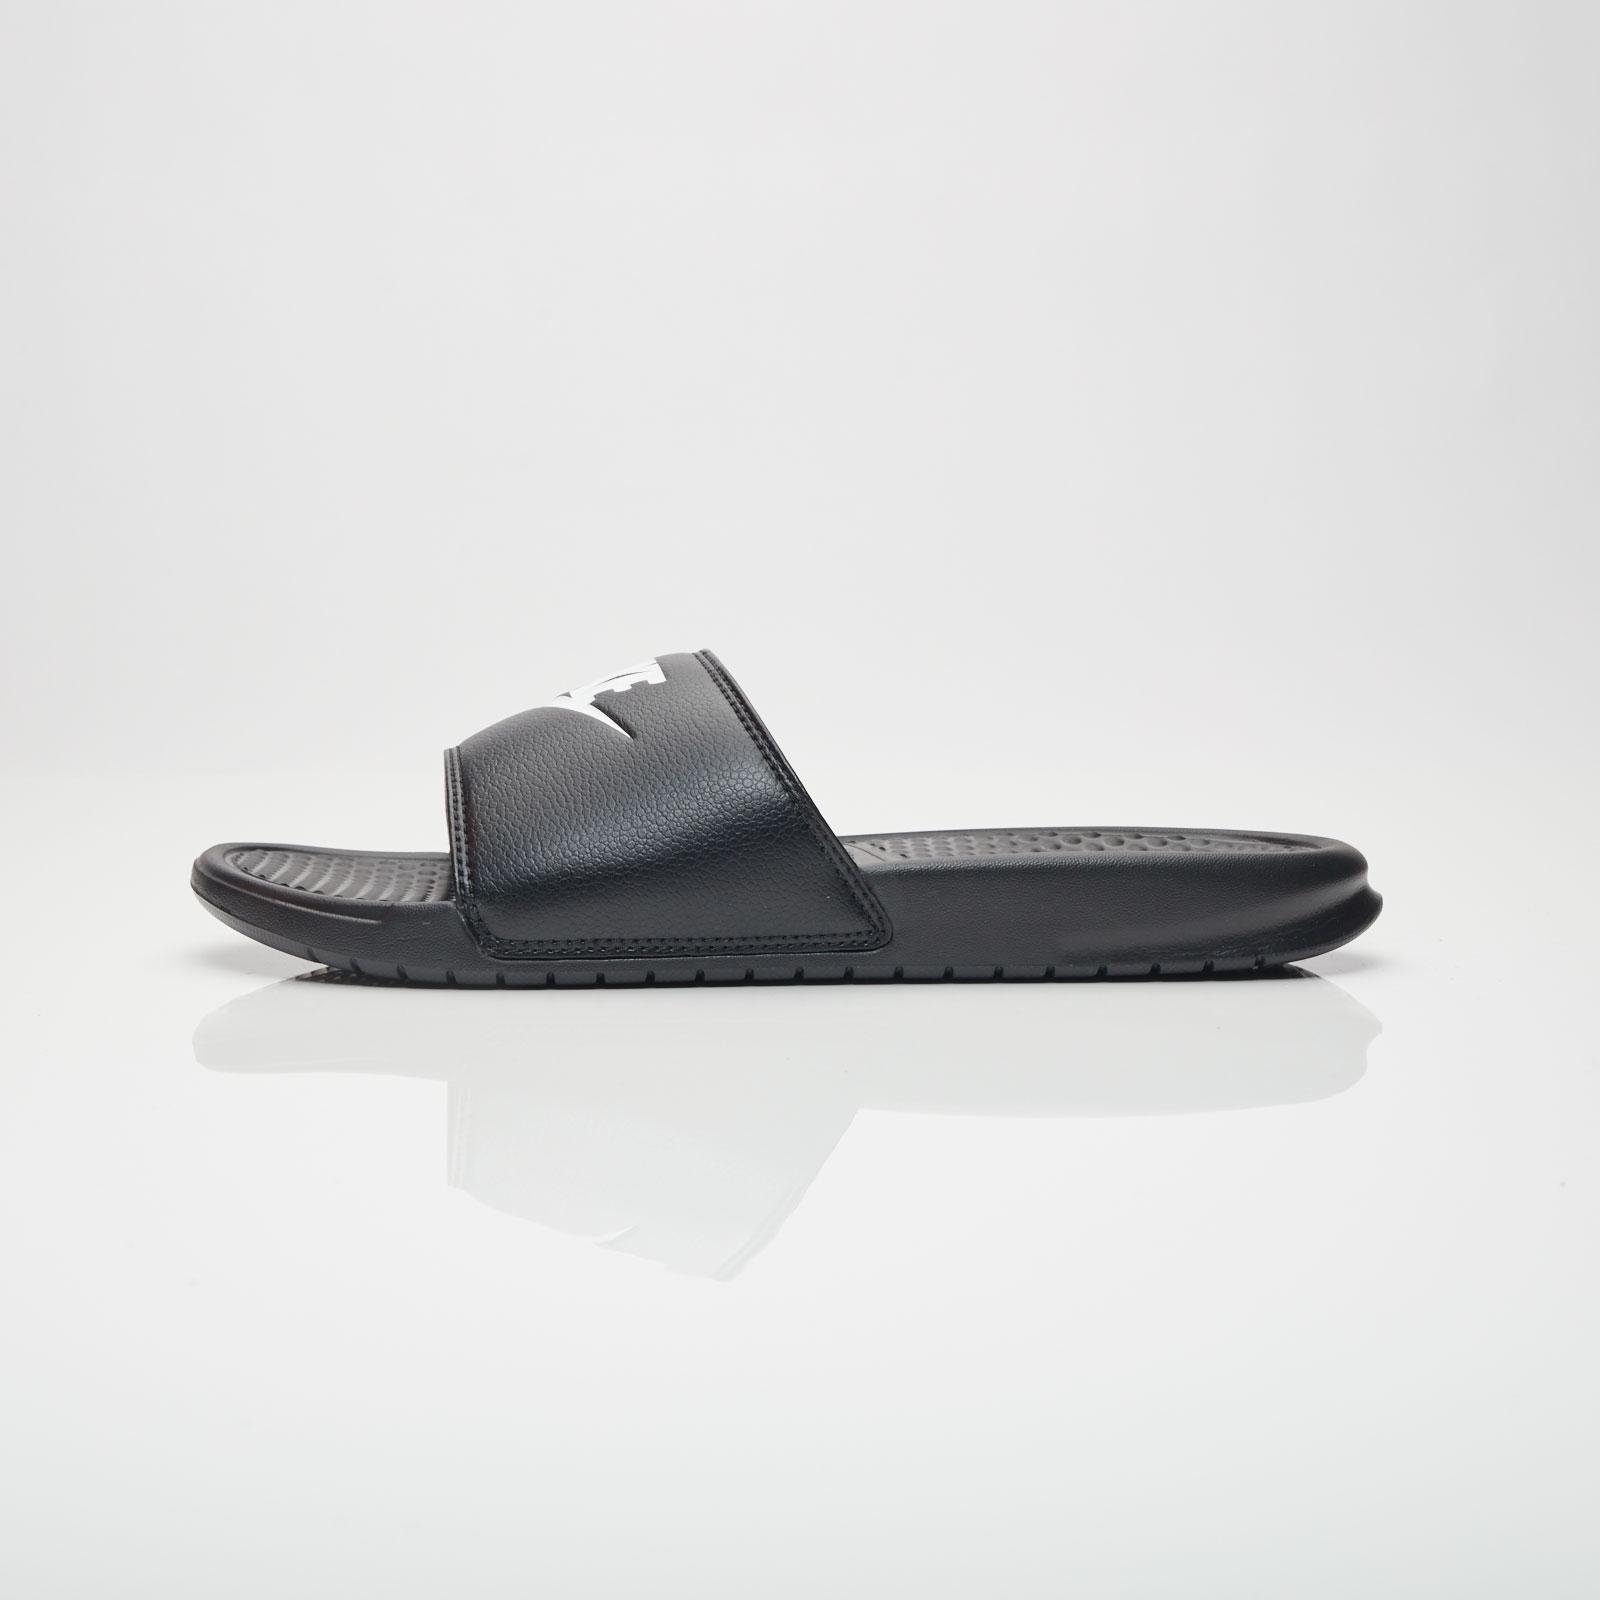 237a37d0708 Nike Benassi JDI - 343880-090 - Sneakersnstuff